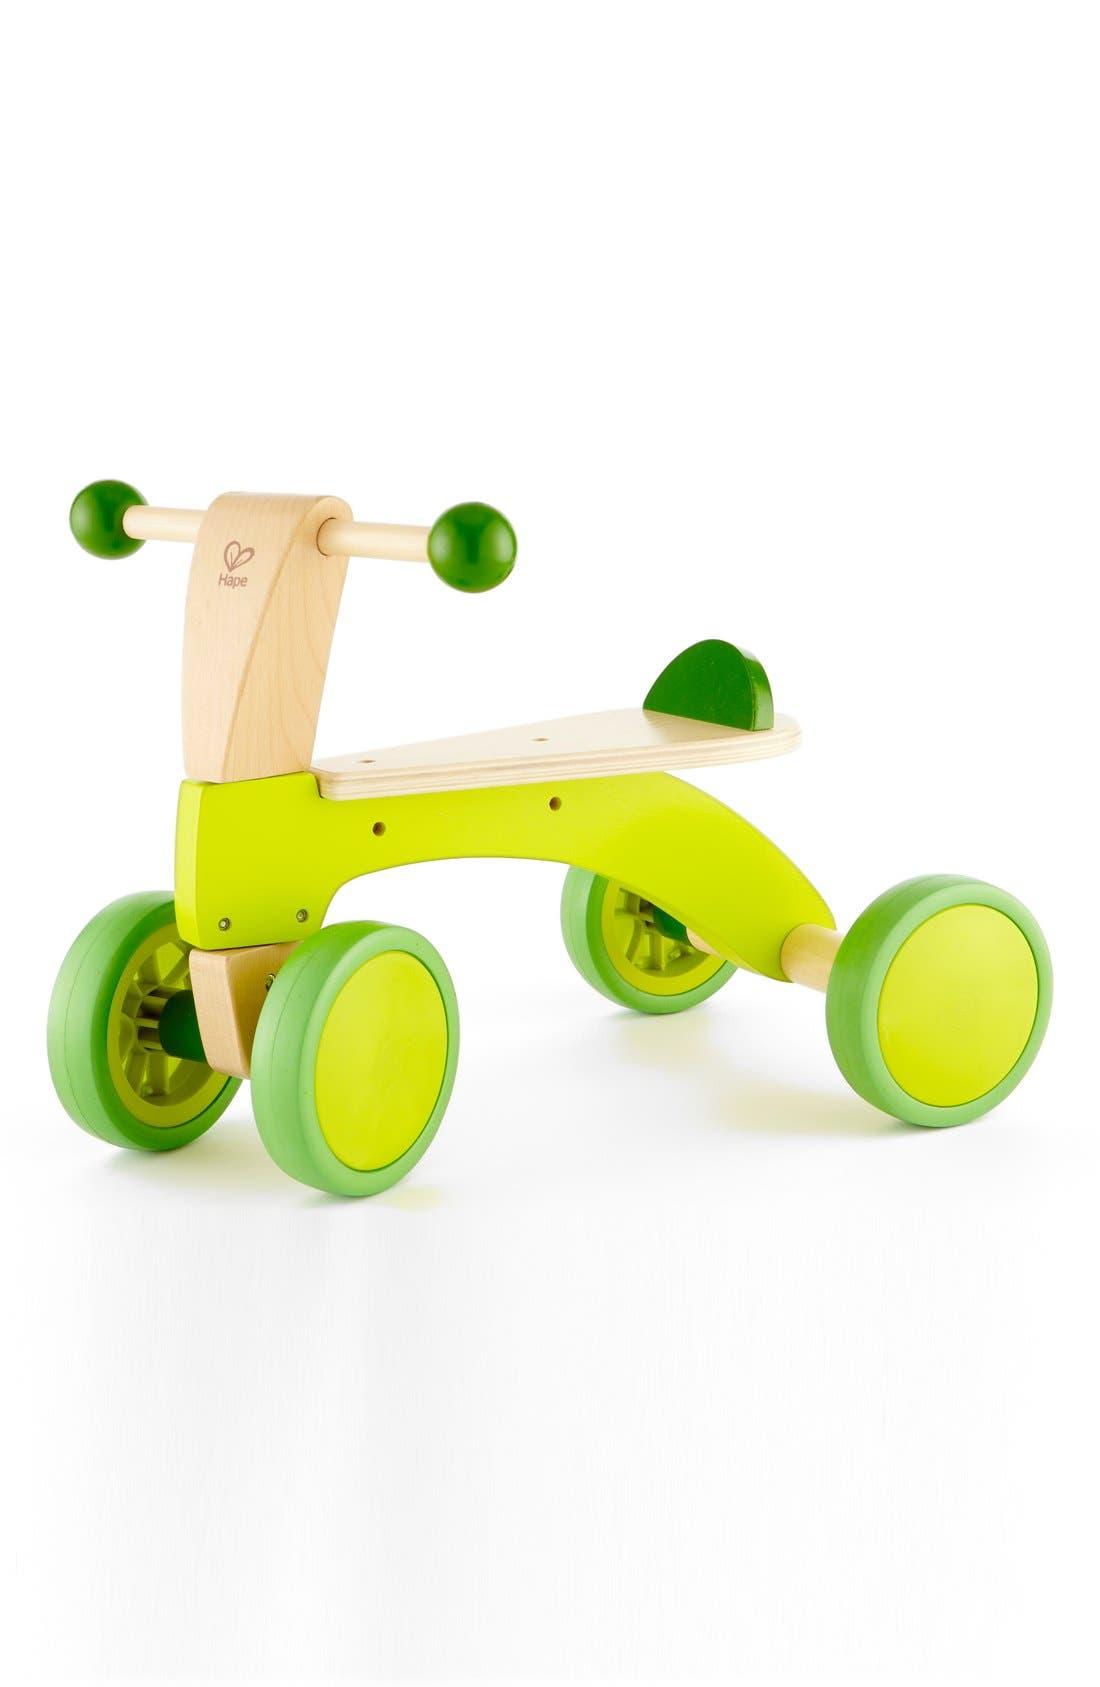 Main Image - Hape 'Scoot-Around' Riding Toy